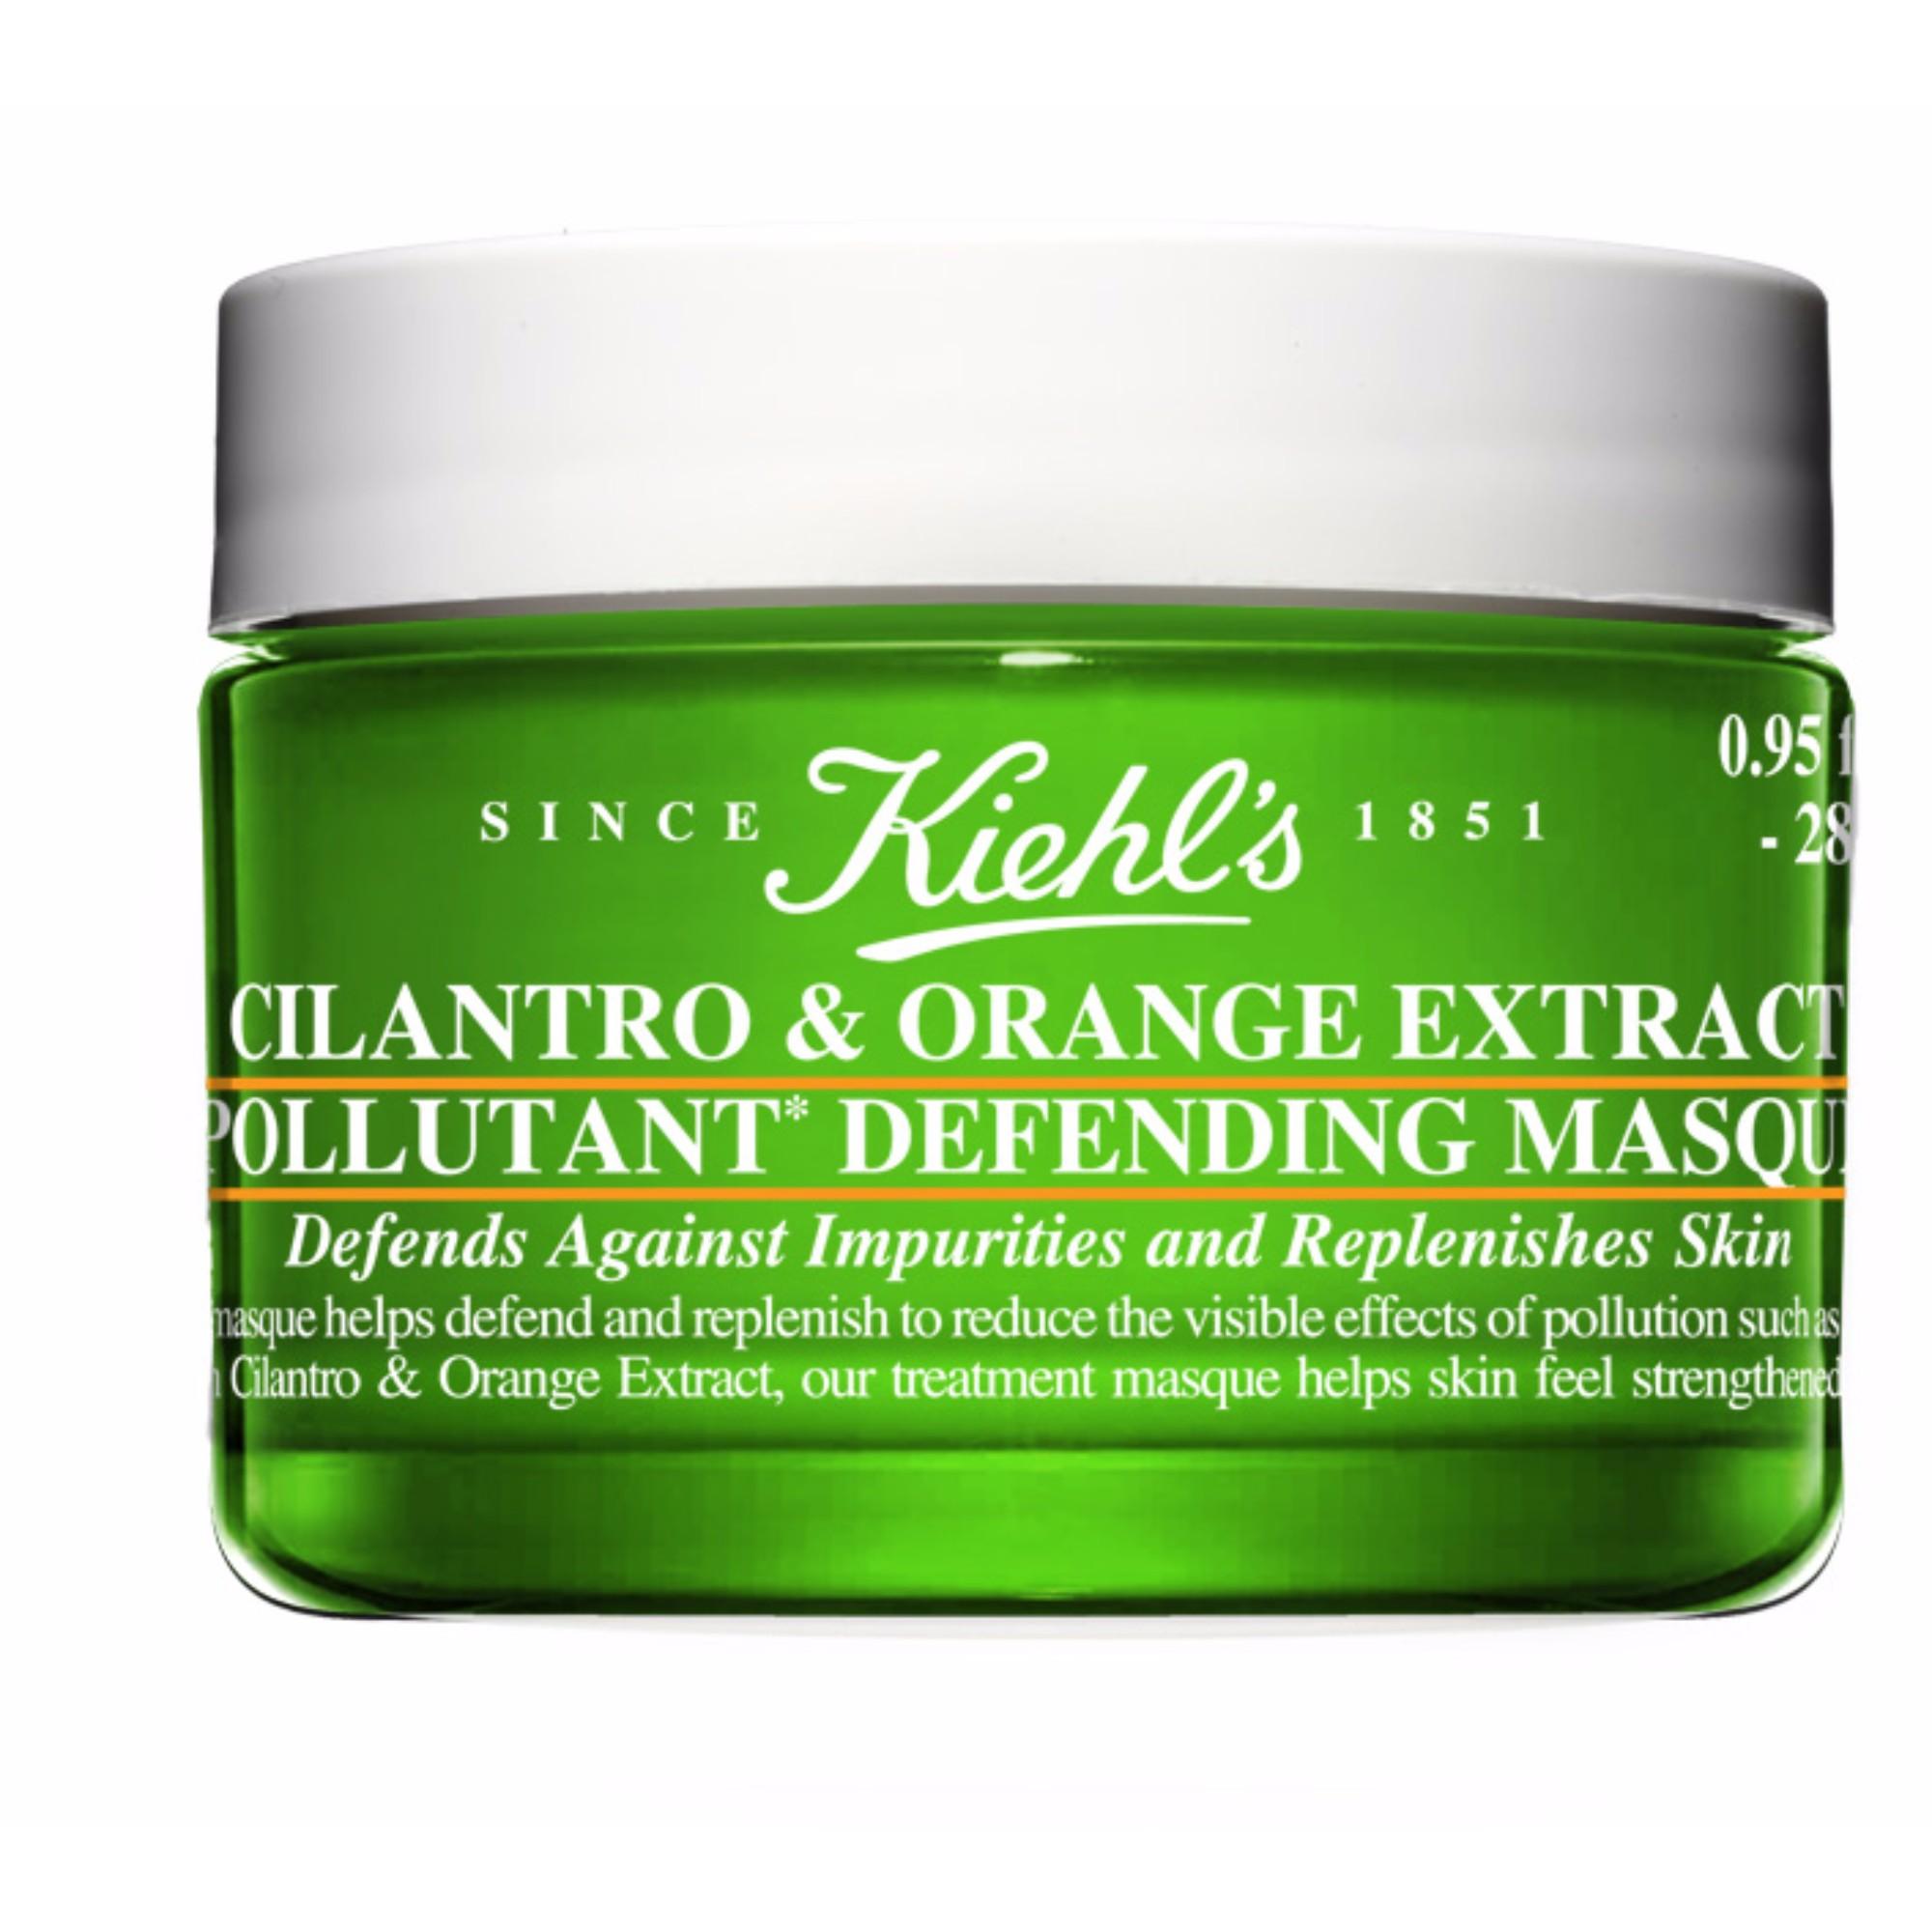 Cilantro & Orange Extract Pollitant Purifiying Face Masque 28ml